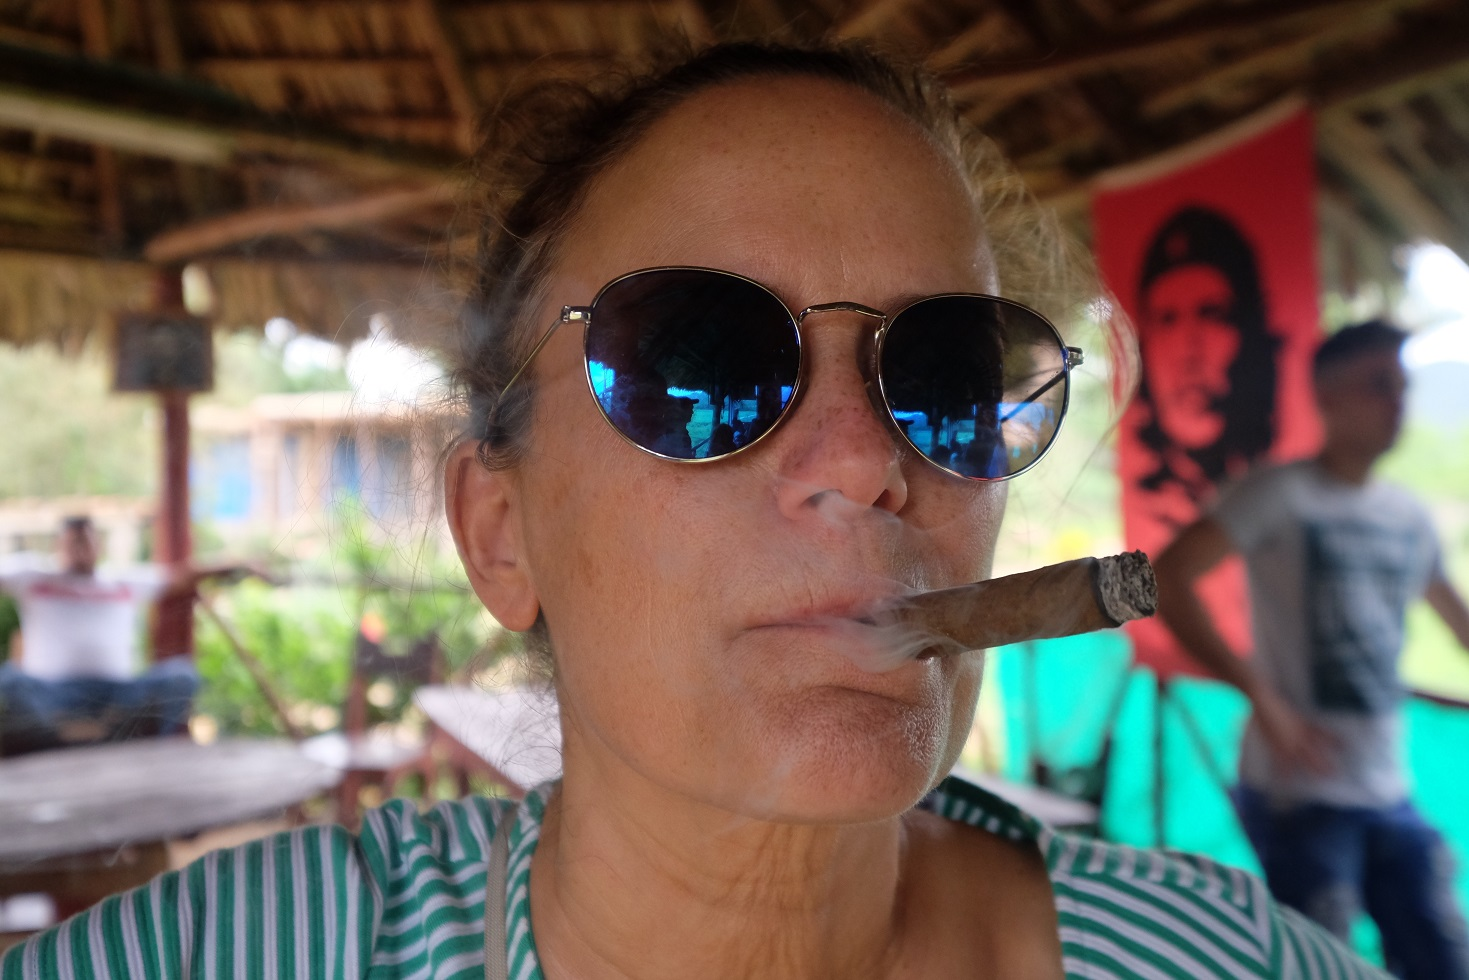 Cuba, cigars